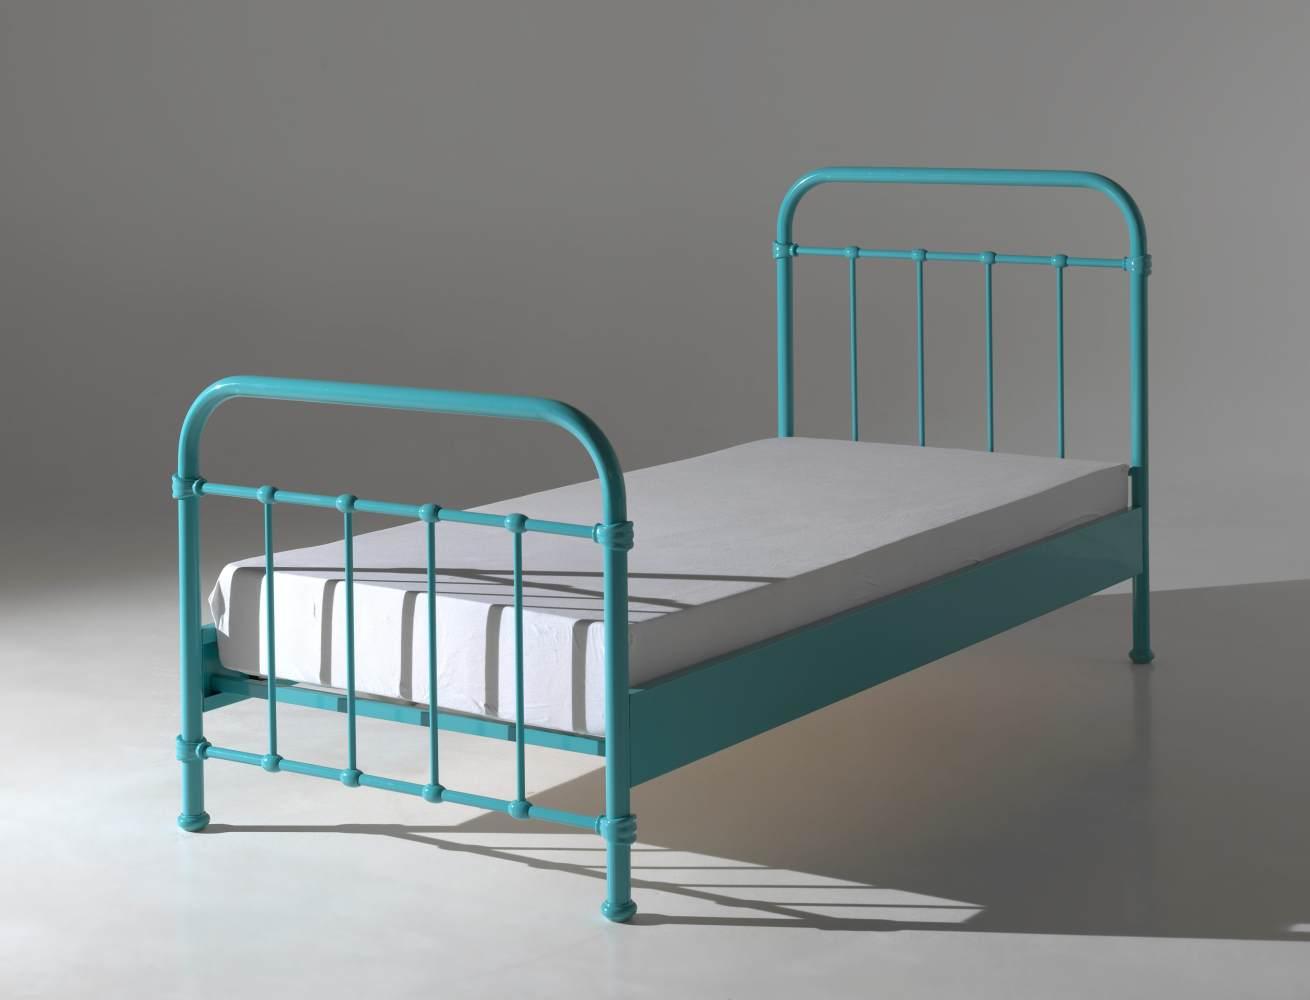 Vipack 'New York' Einzelbett türkis, 90x200 cm Bild 1